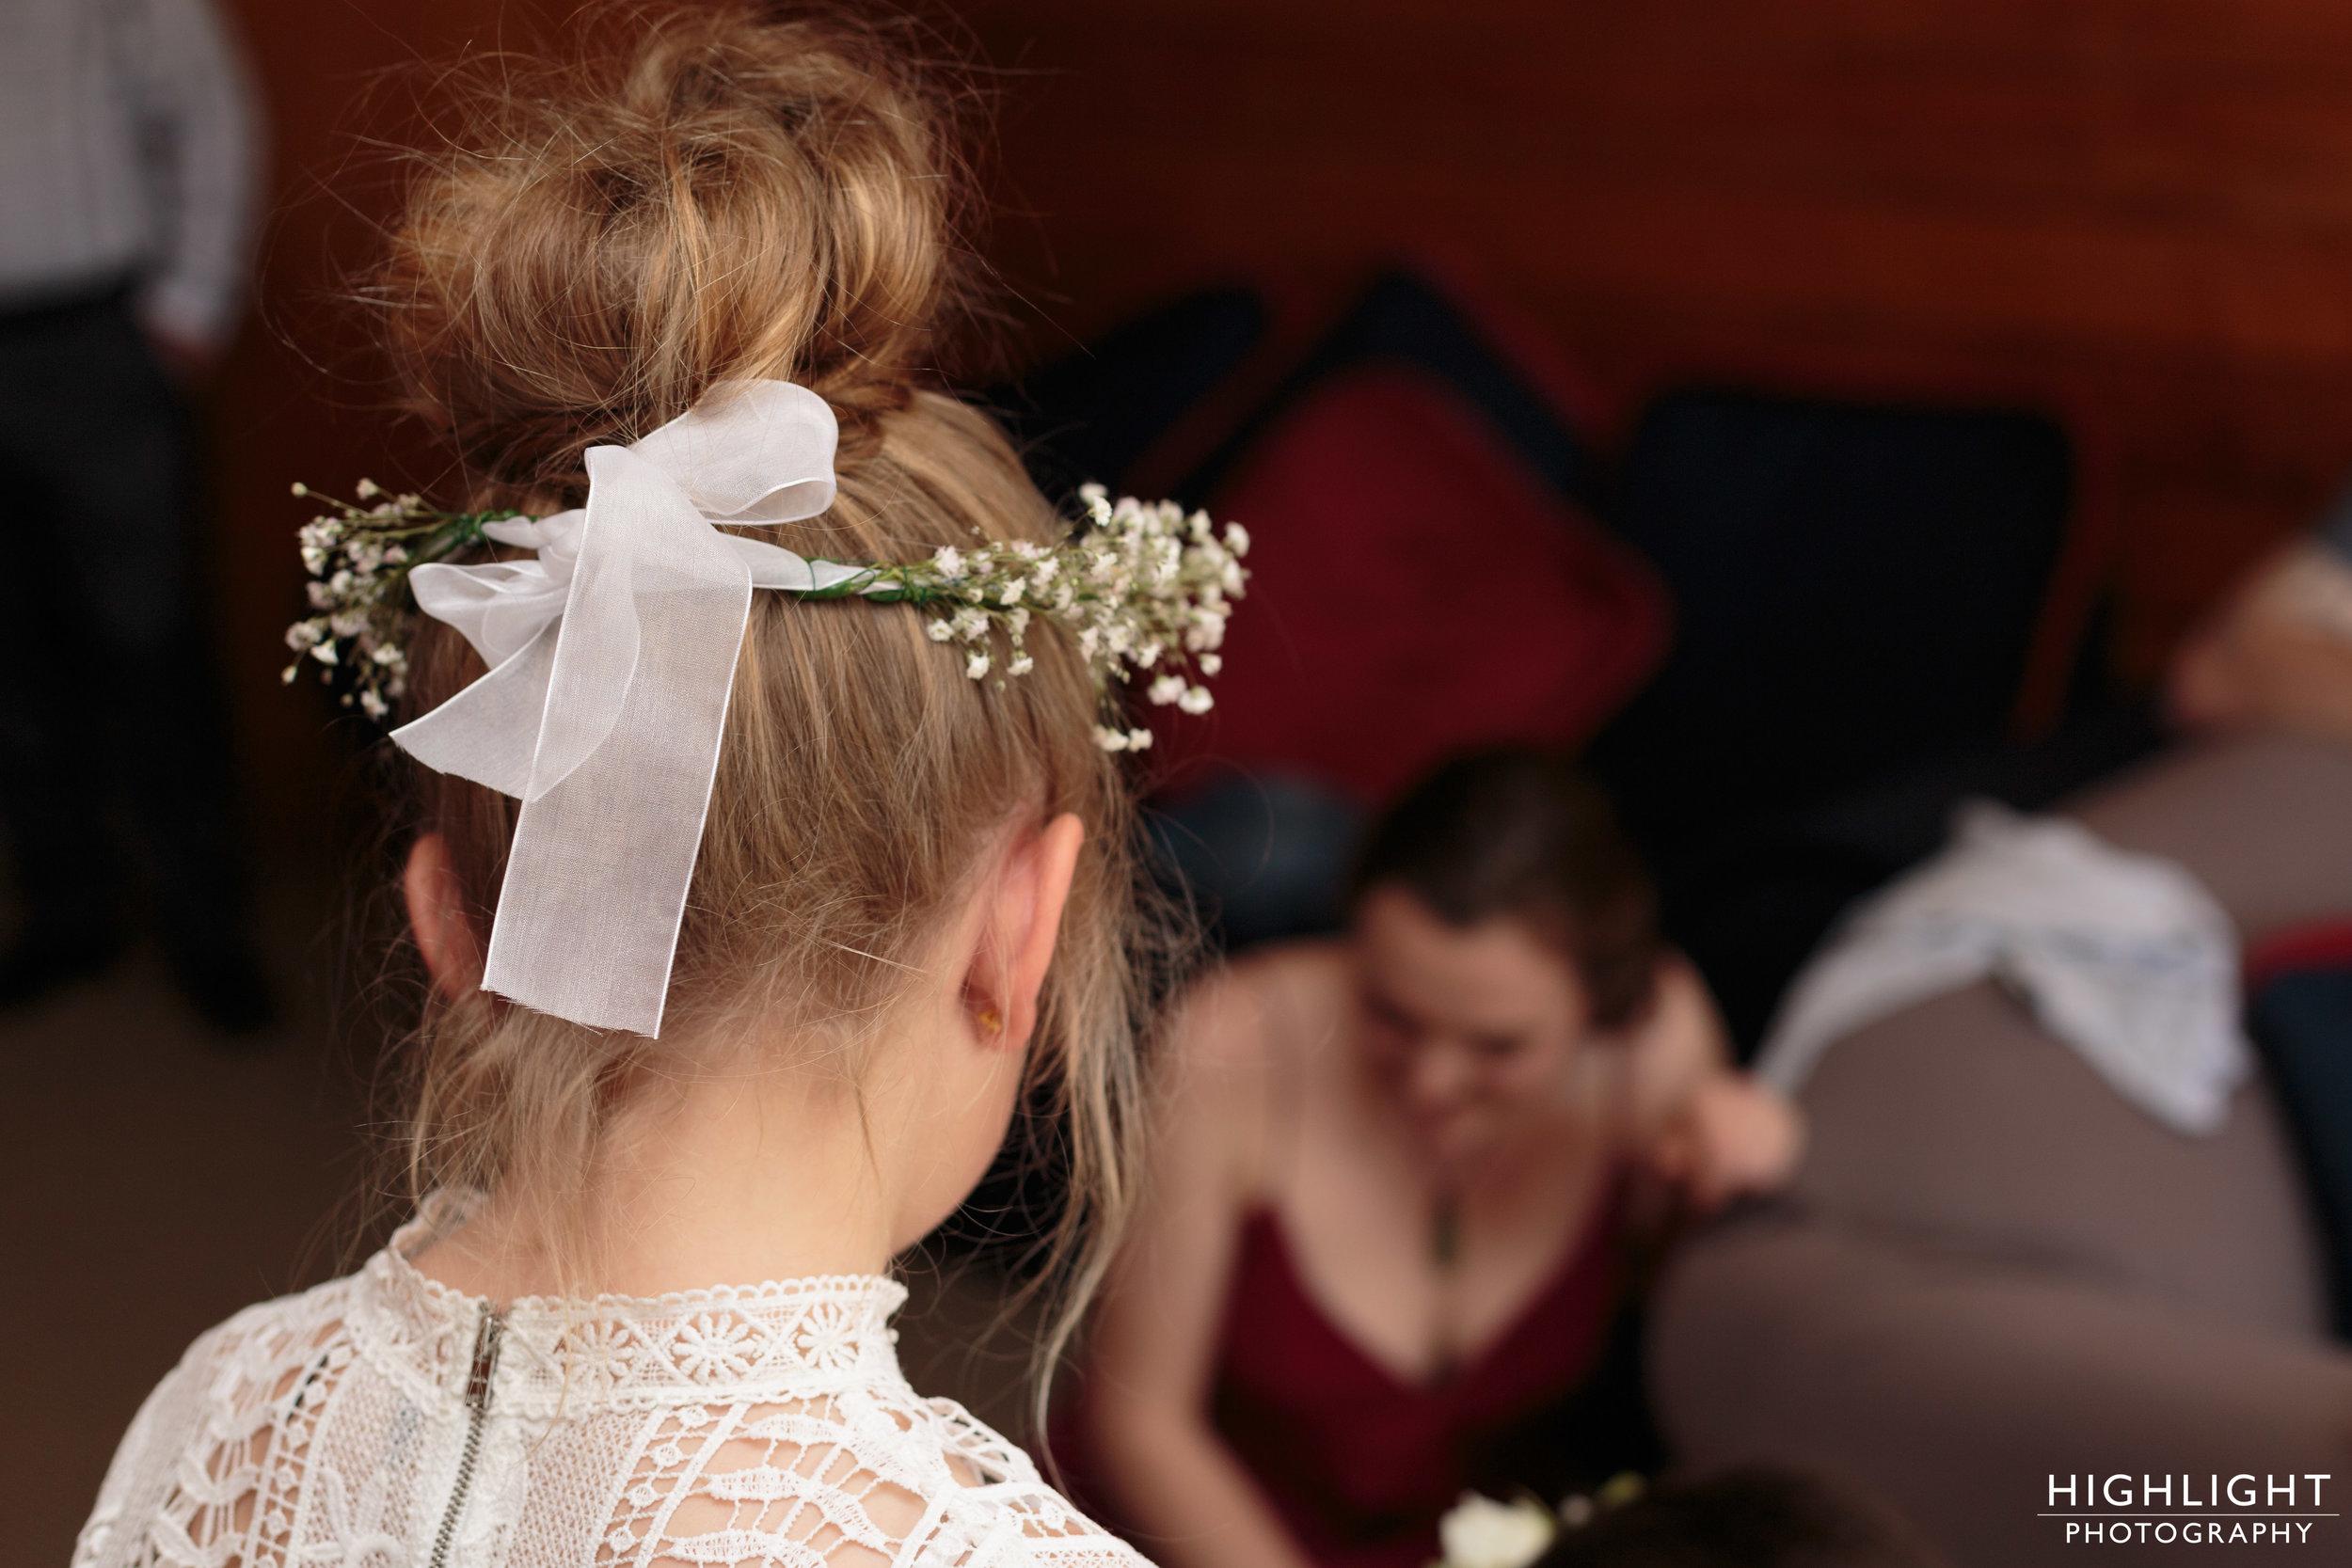 highlight_wedding_photography_makoura_lodge_manawatu_new_zealand-31.jpg